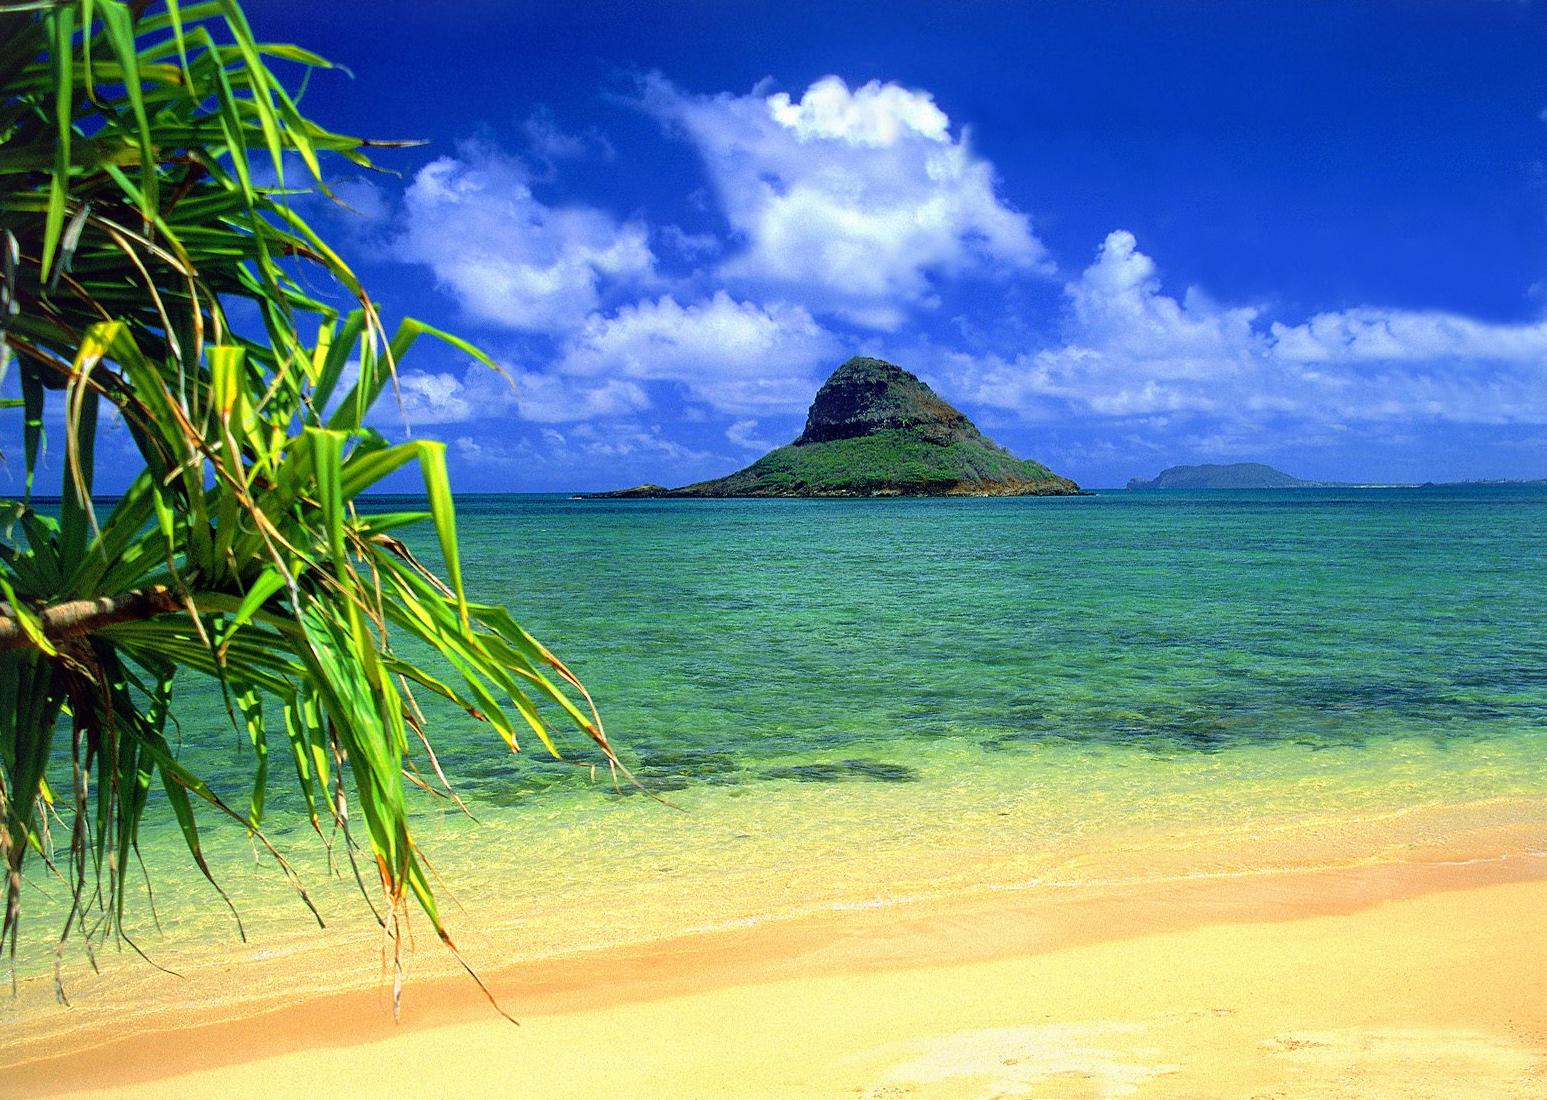 hawaii beach pictures hawaii beach pictures hawaii beach pictures ...